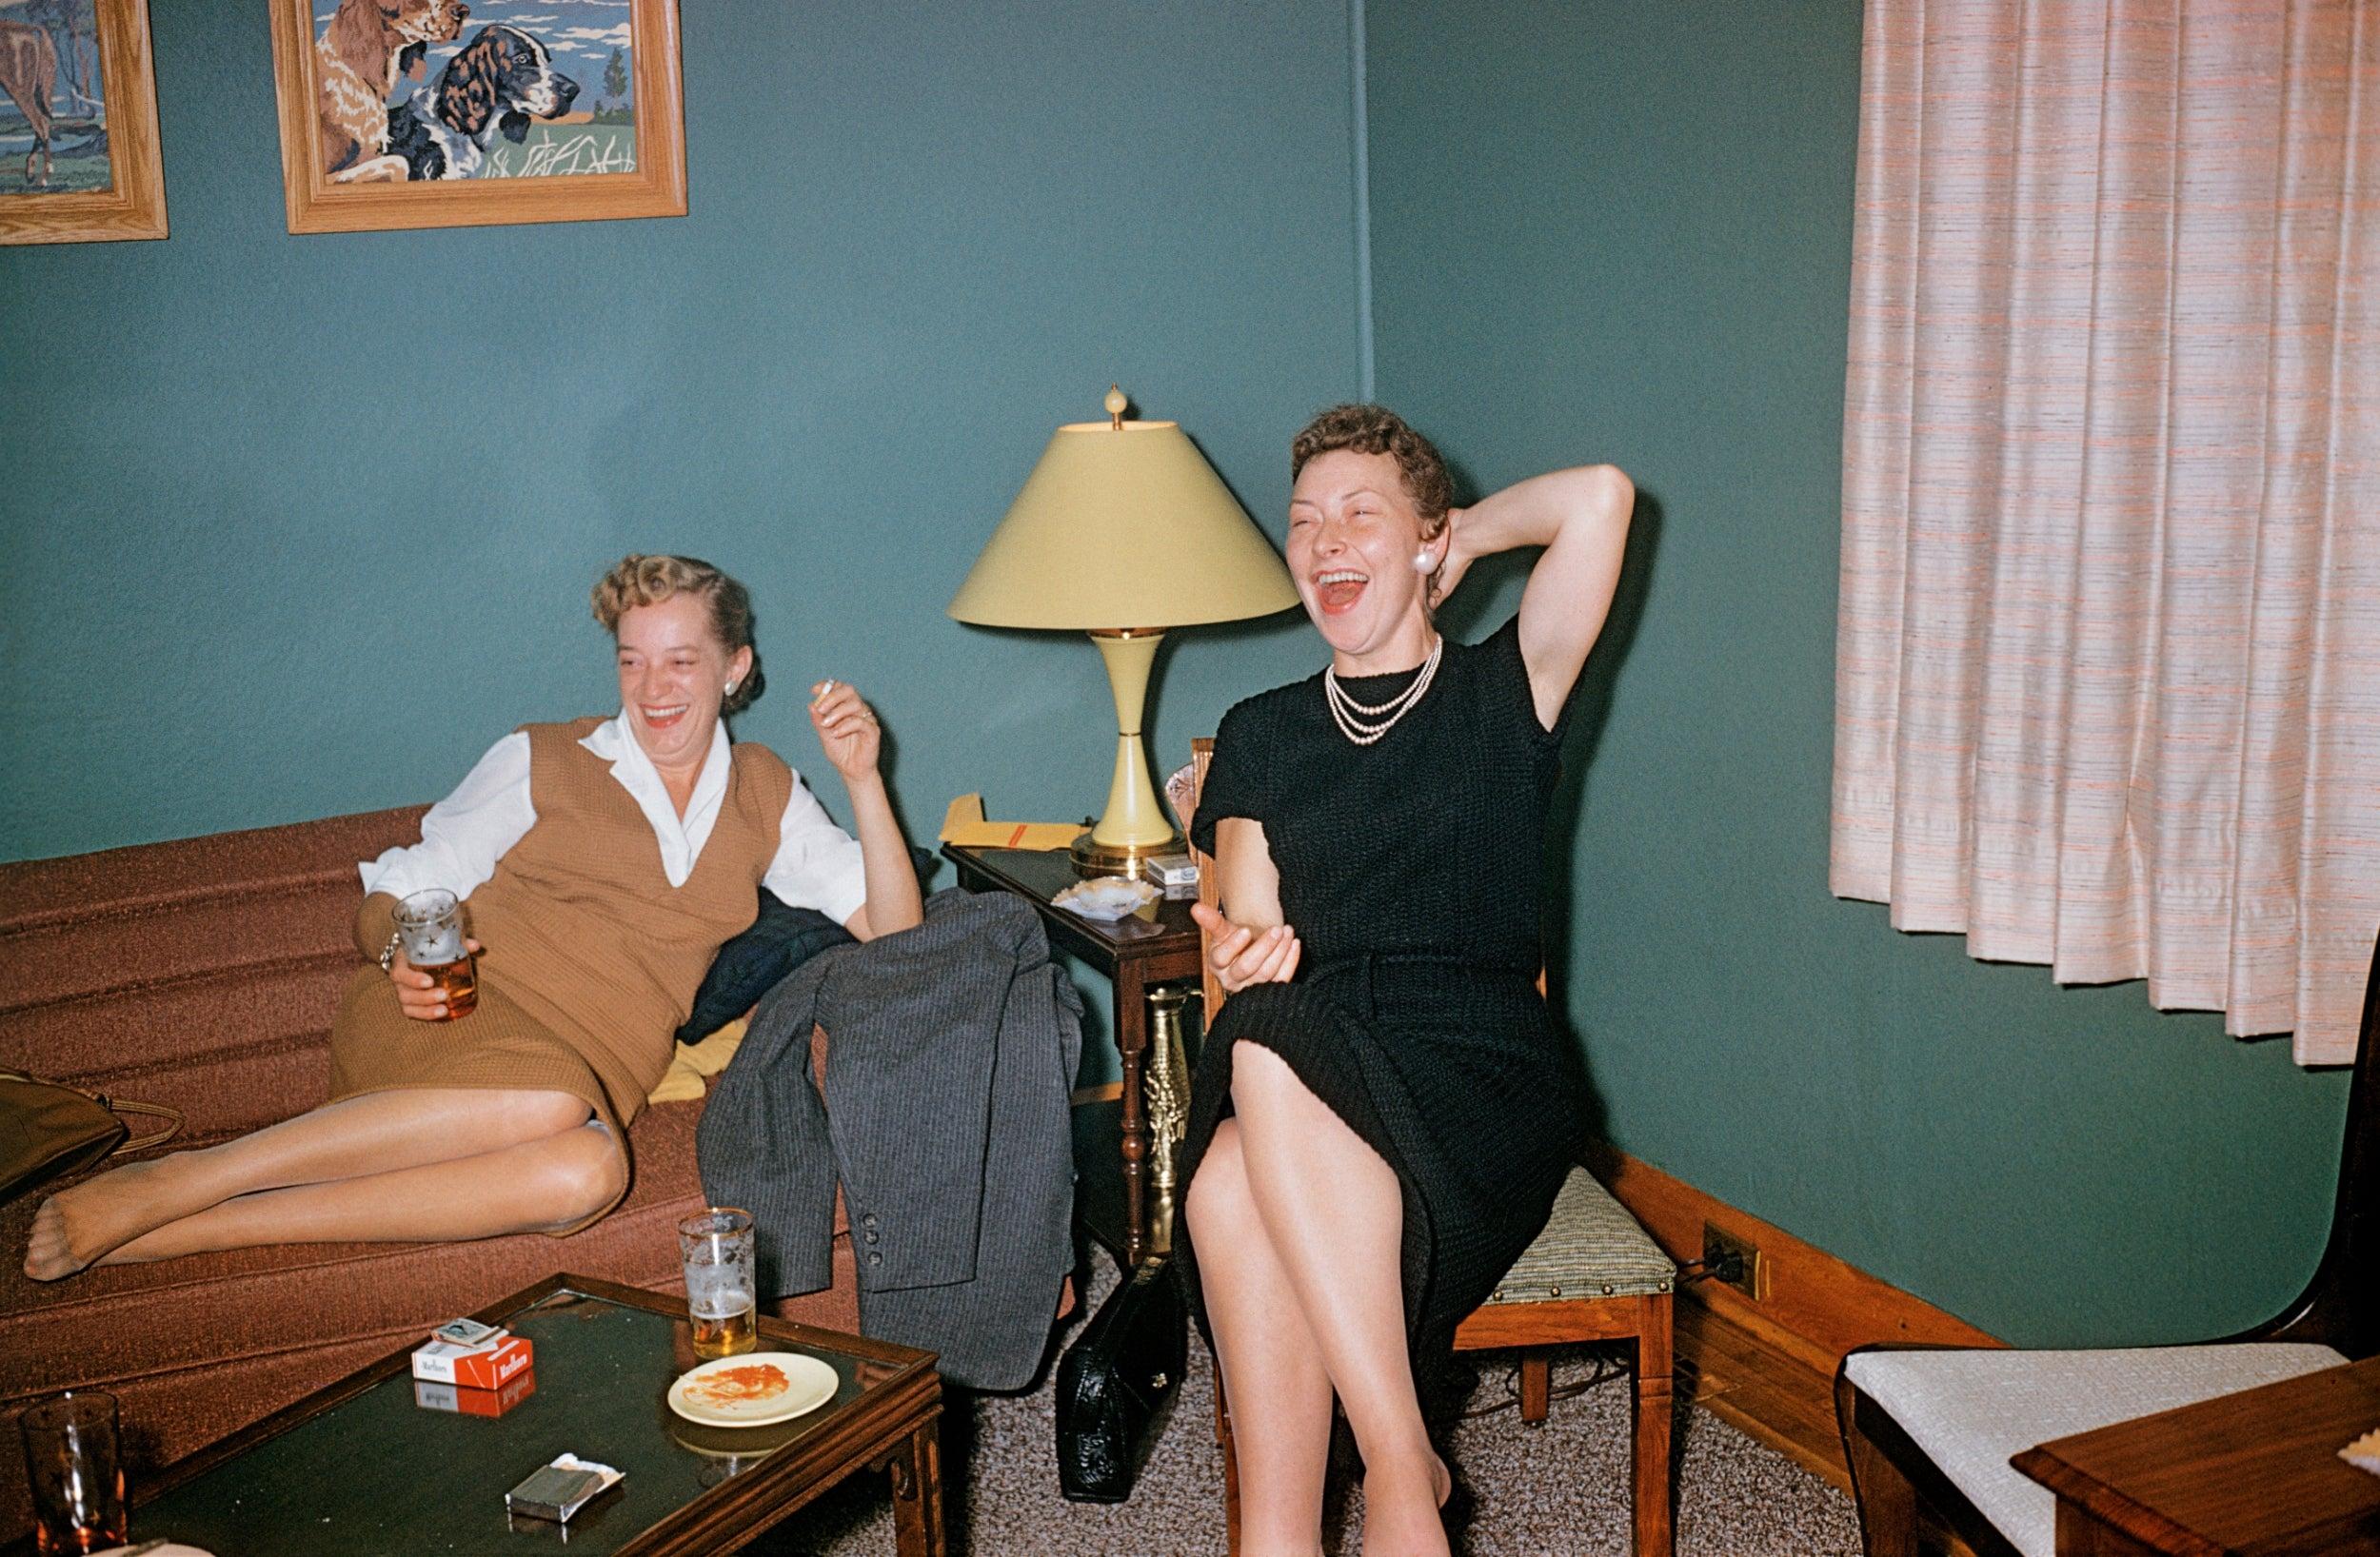 Amateur Photos midcentury memories: anonymous photography project explores